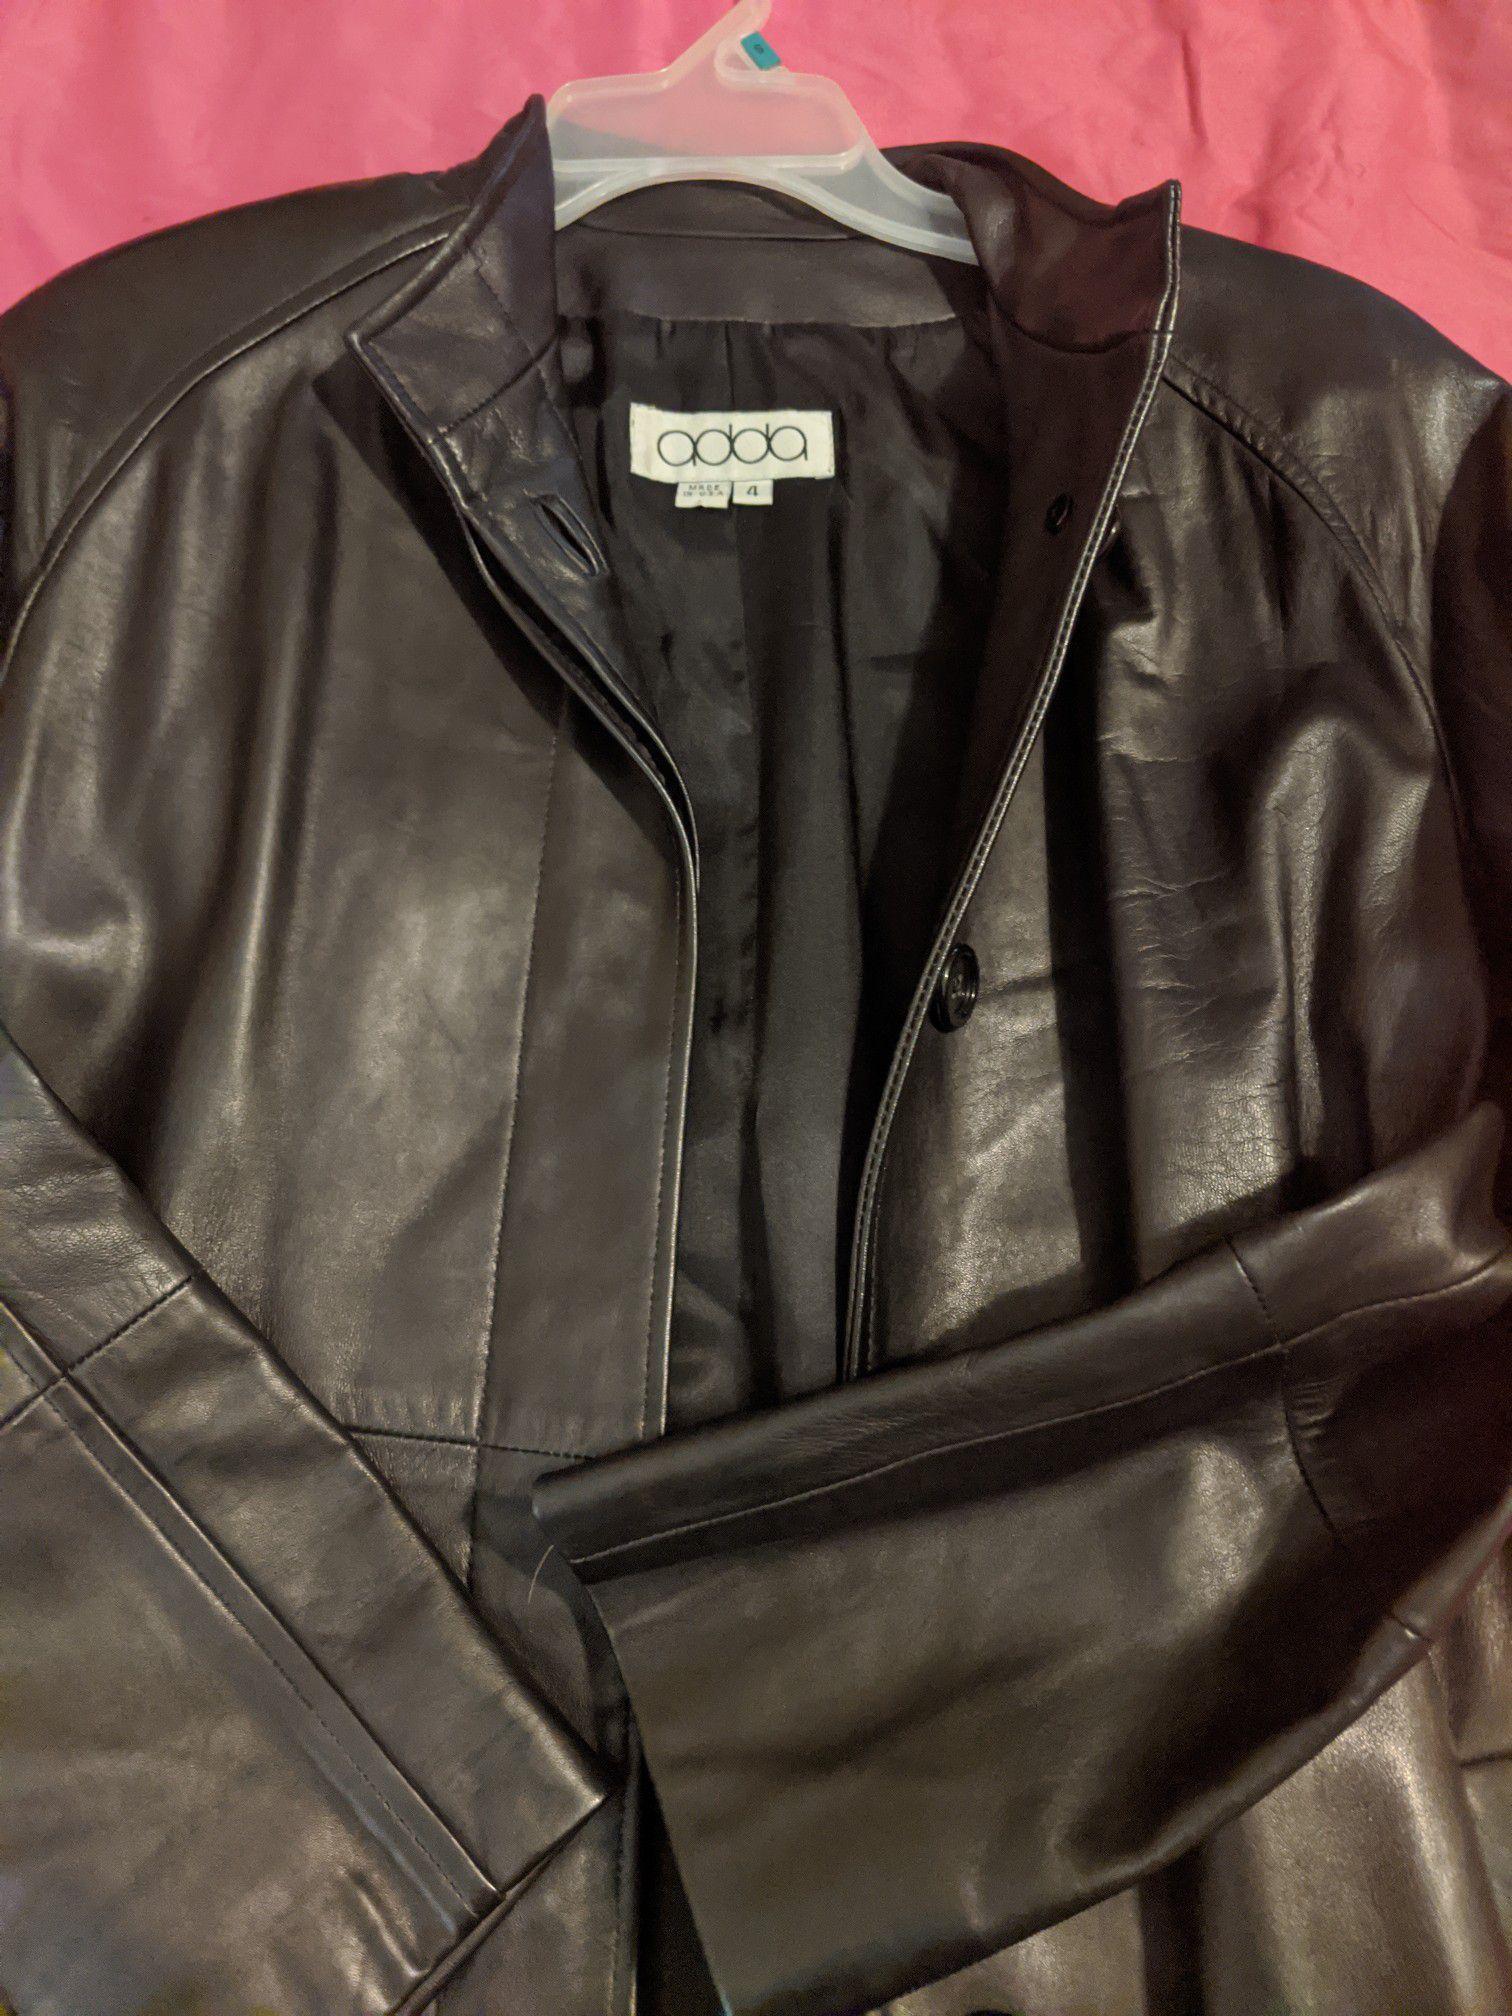 Size 4 Adda soft leather coat.